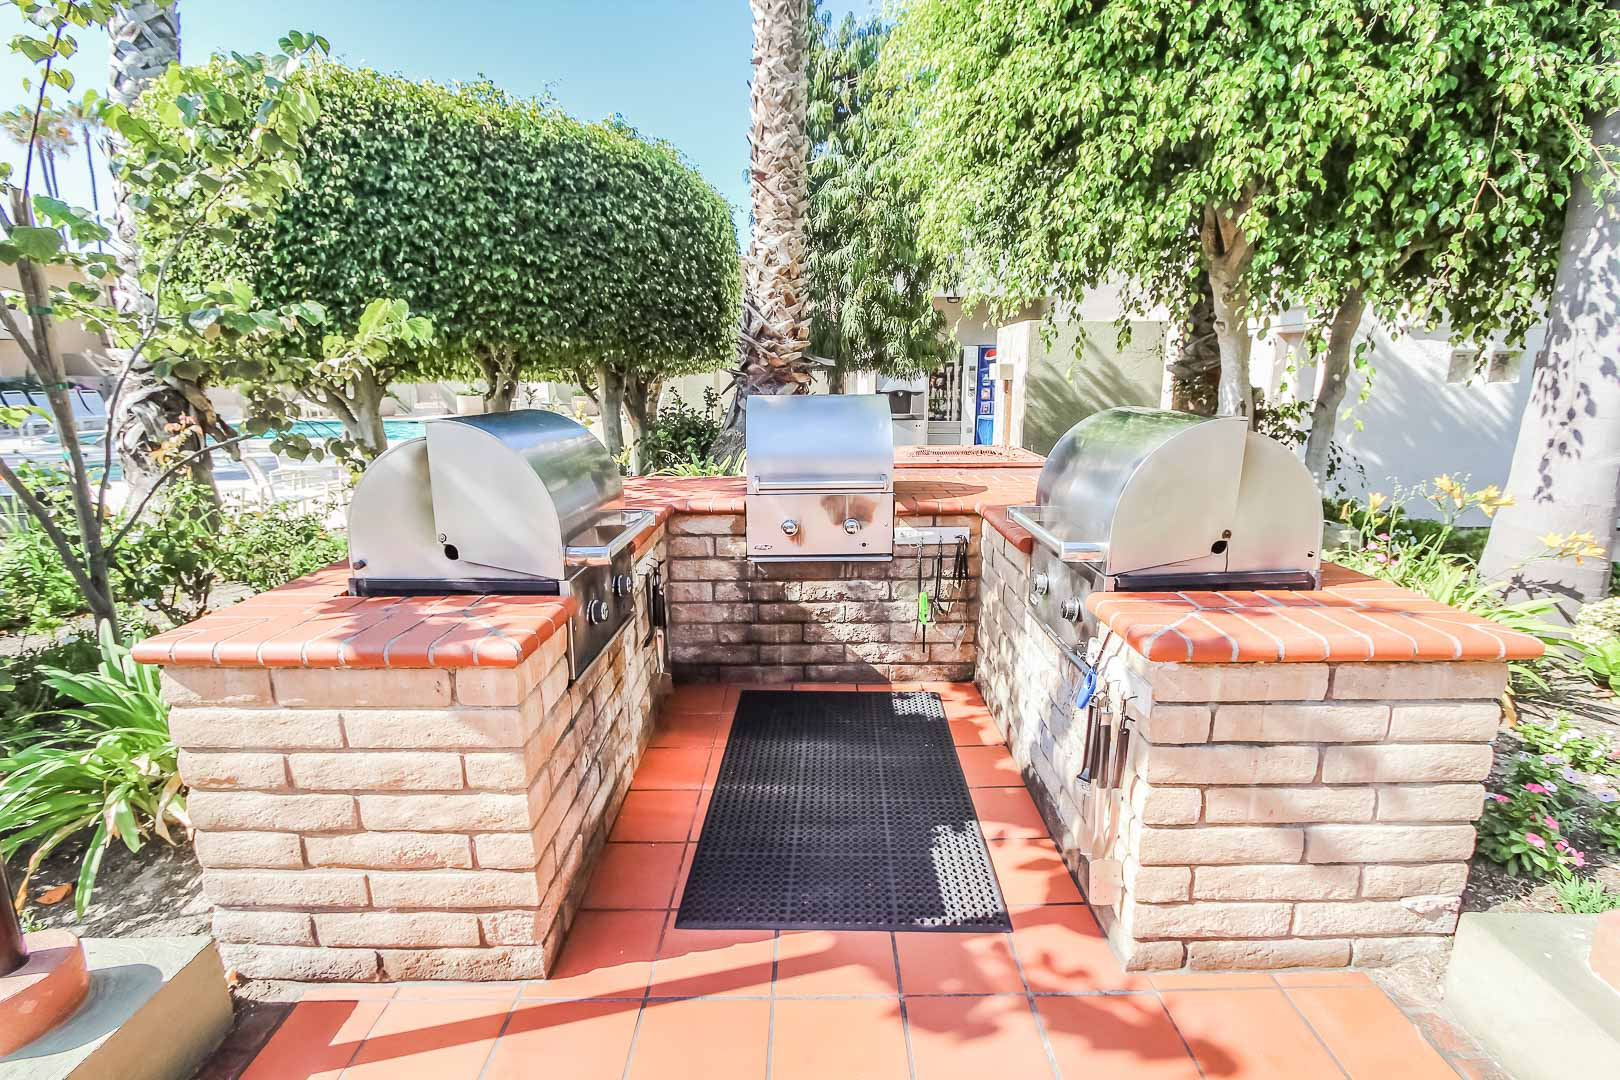 Stoic BBQ Grills at VRI's Winner Circle Resort in California.